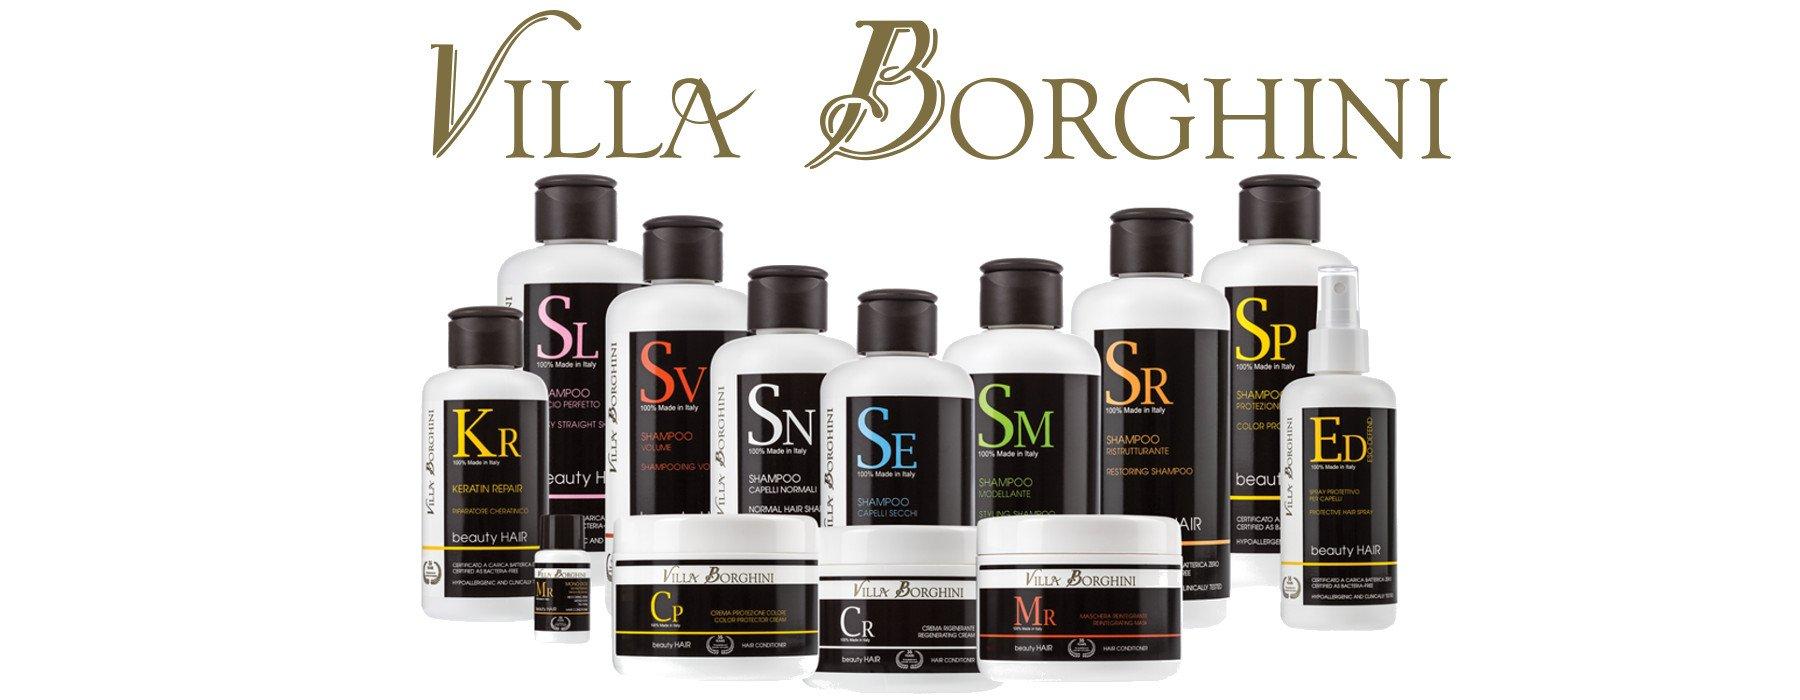 Villa Borghini - Beauty Hair